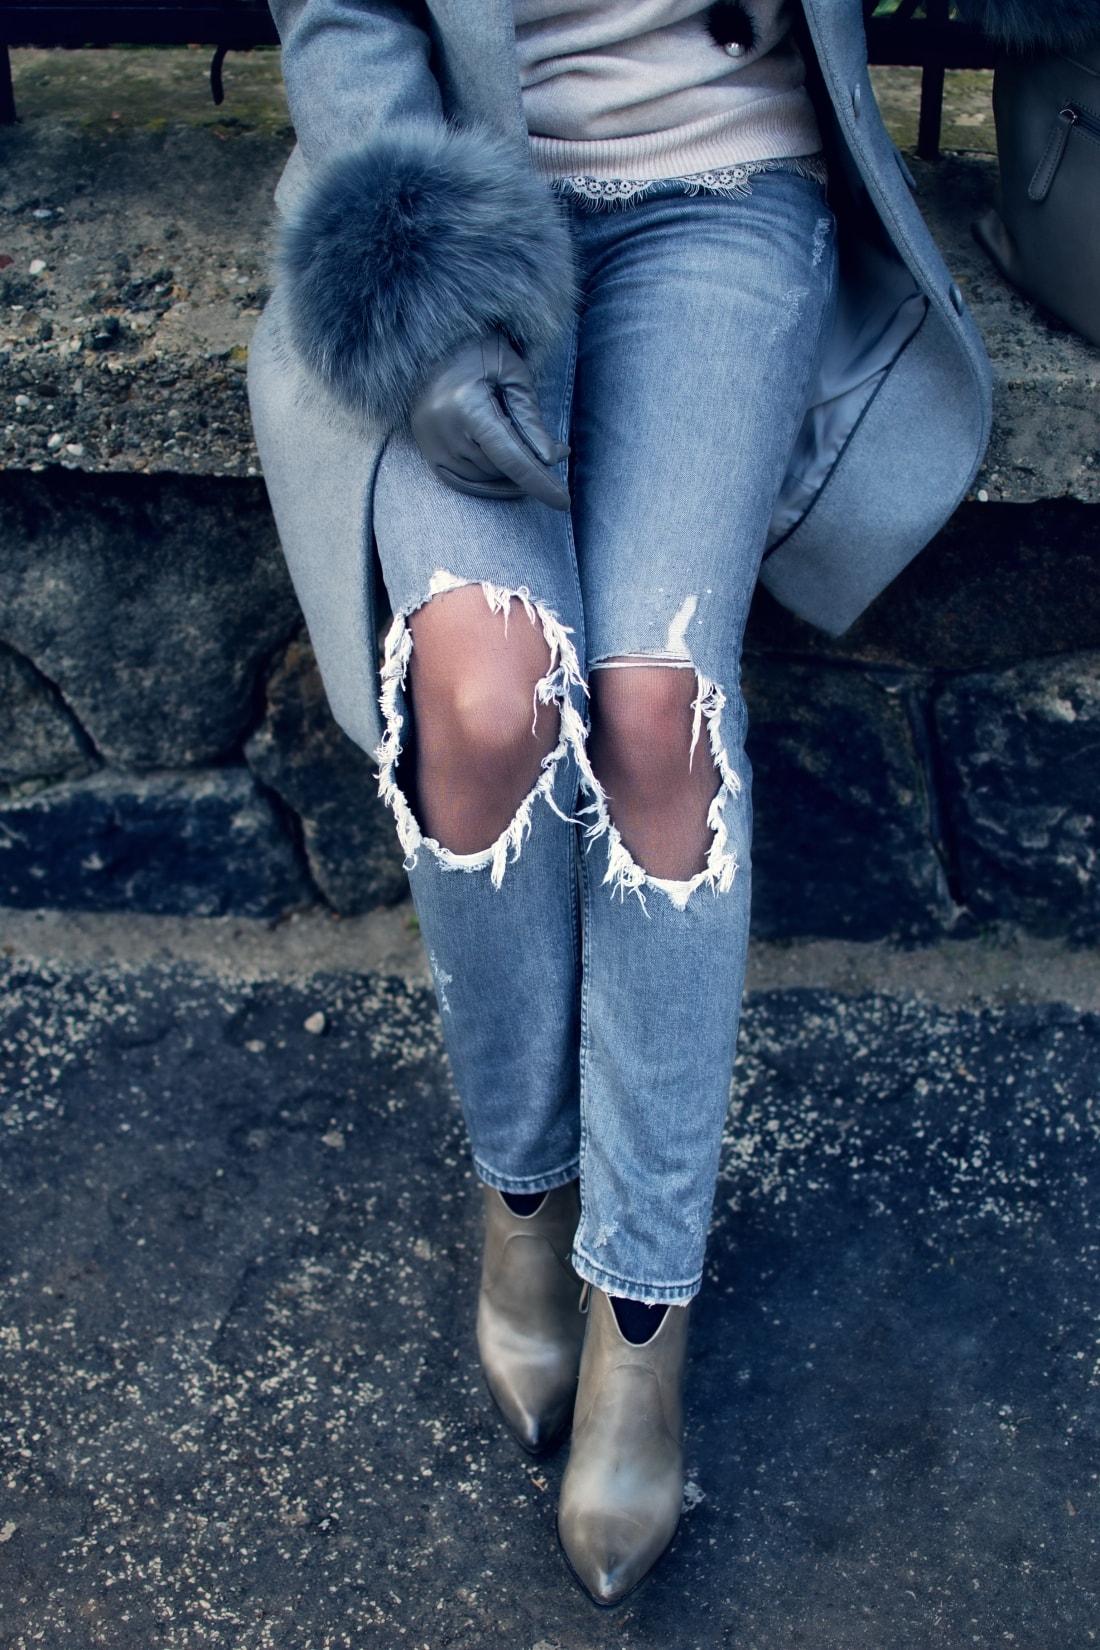 Kožušinové doplnky_Katharine-fashion is beautiful_blog 5_Sivý kabát_Roztrhané džínsy Zara_Katarína Jakubčová_Fashion blogger